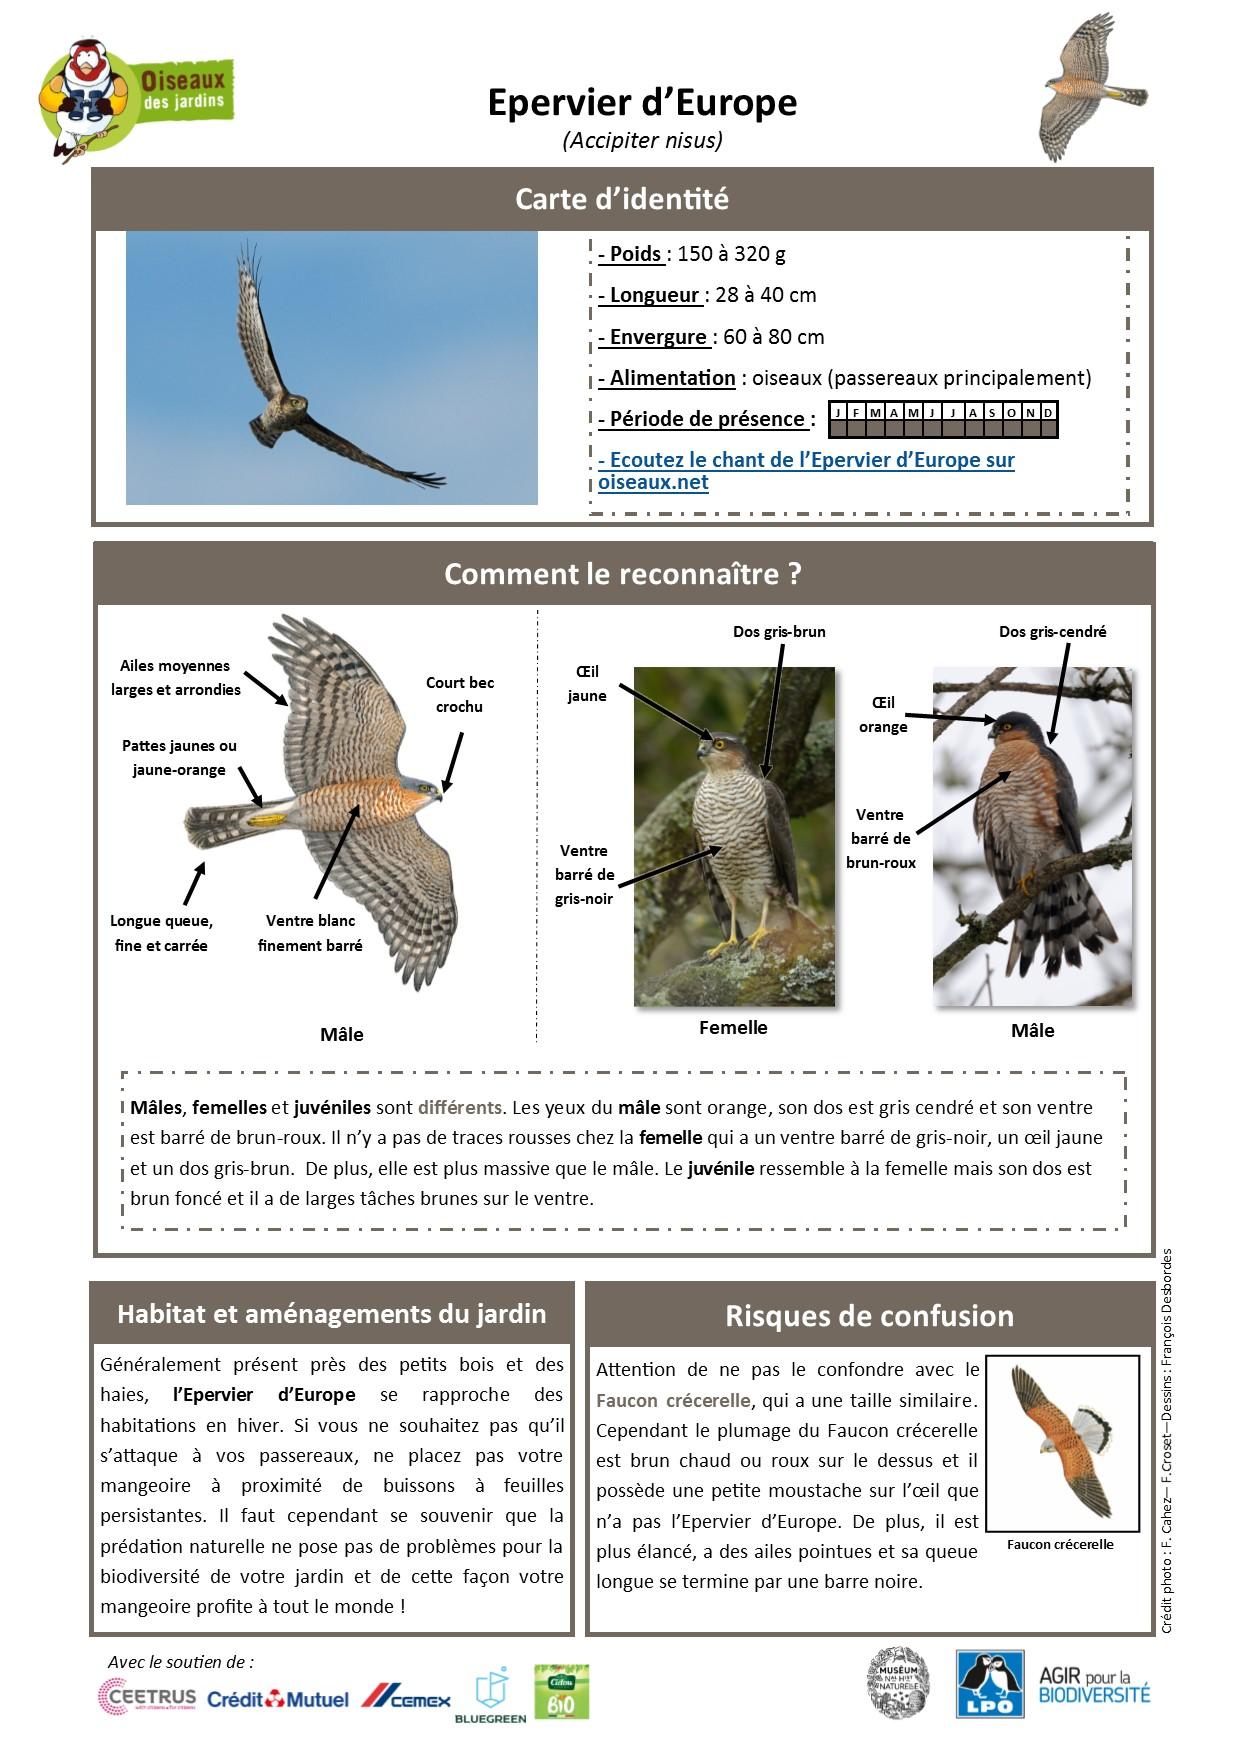 https://cdnfiles2.biolovision.net/www.oiseauxdesjardins.fr/userfiles/Fichesespces/FicheespceEE.pdf